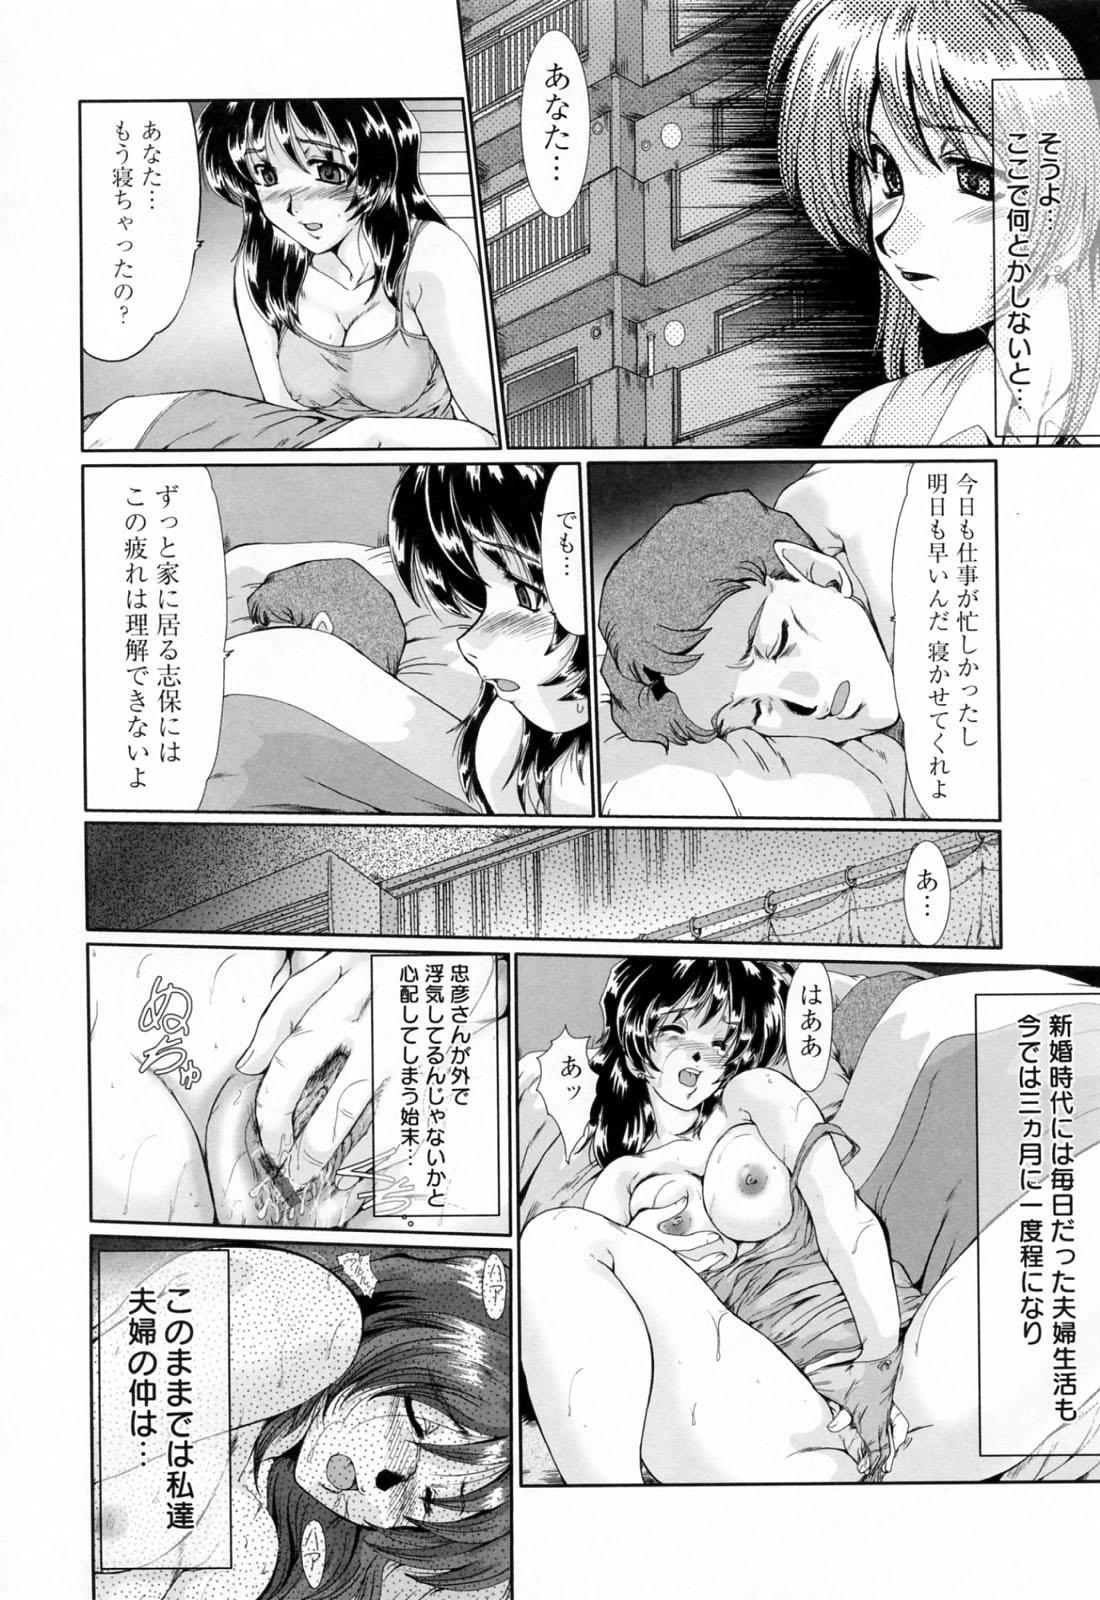 Kanjuku Hitozuma Nikki - The diary of the mature married woman 103